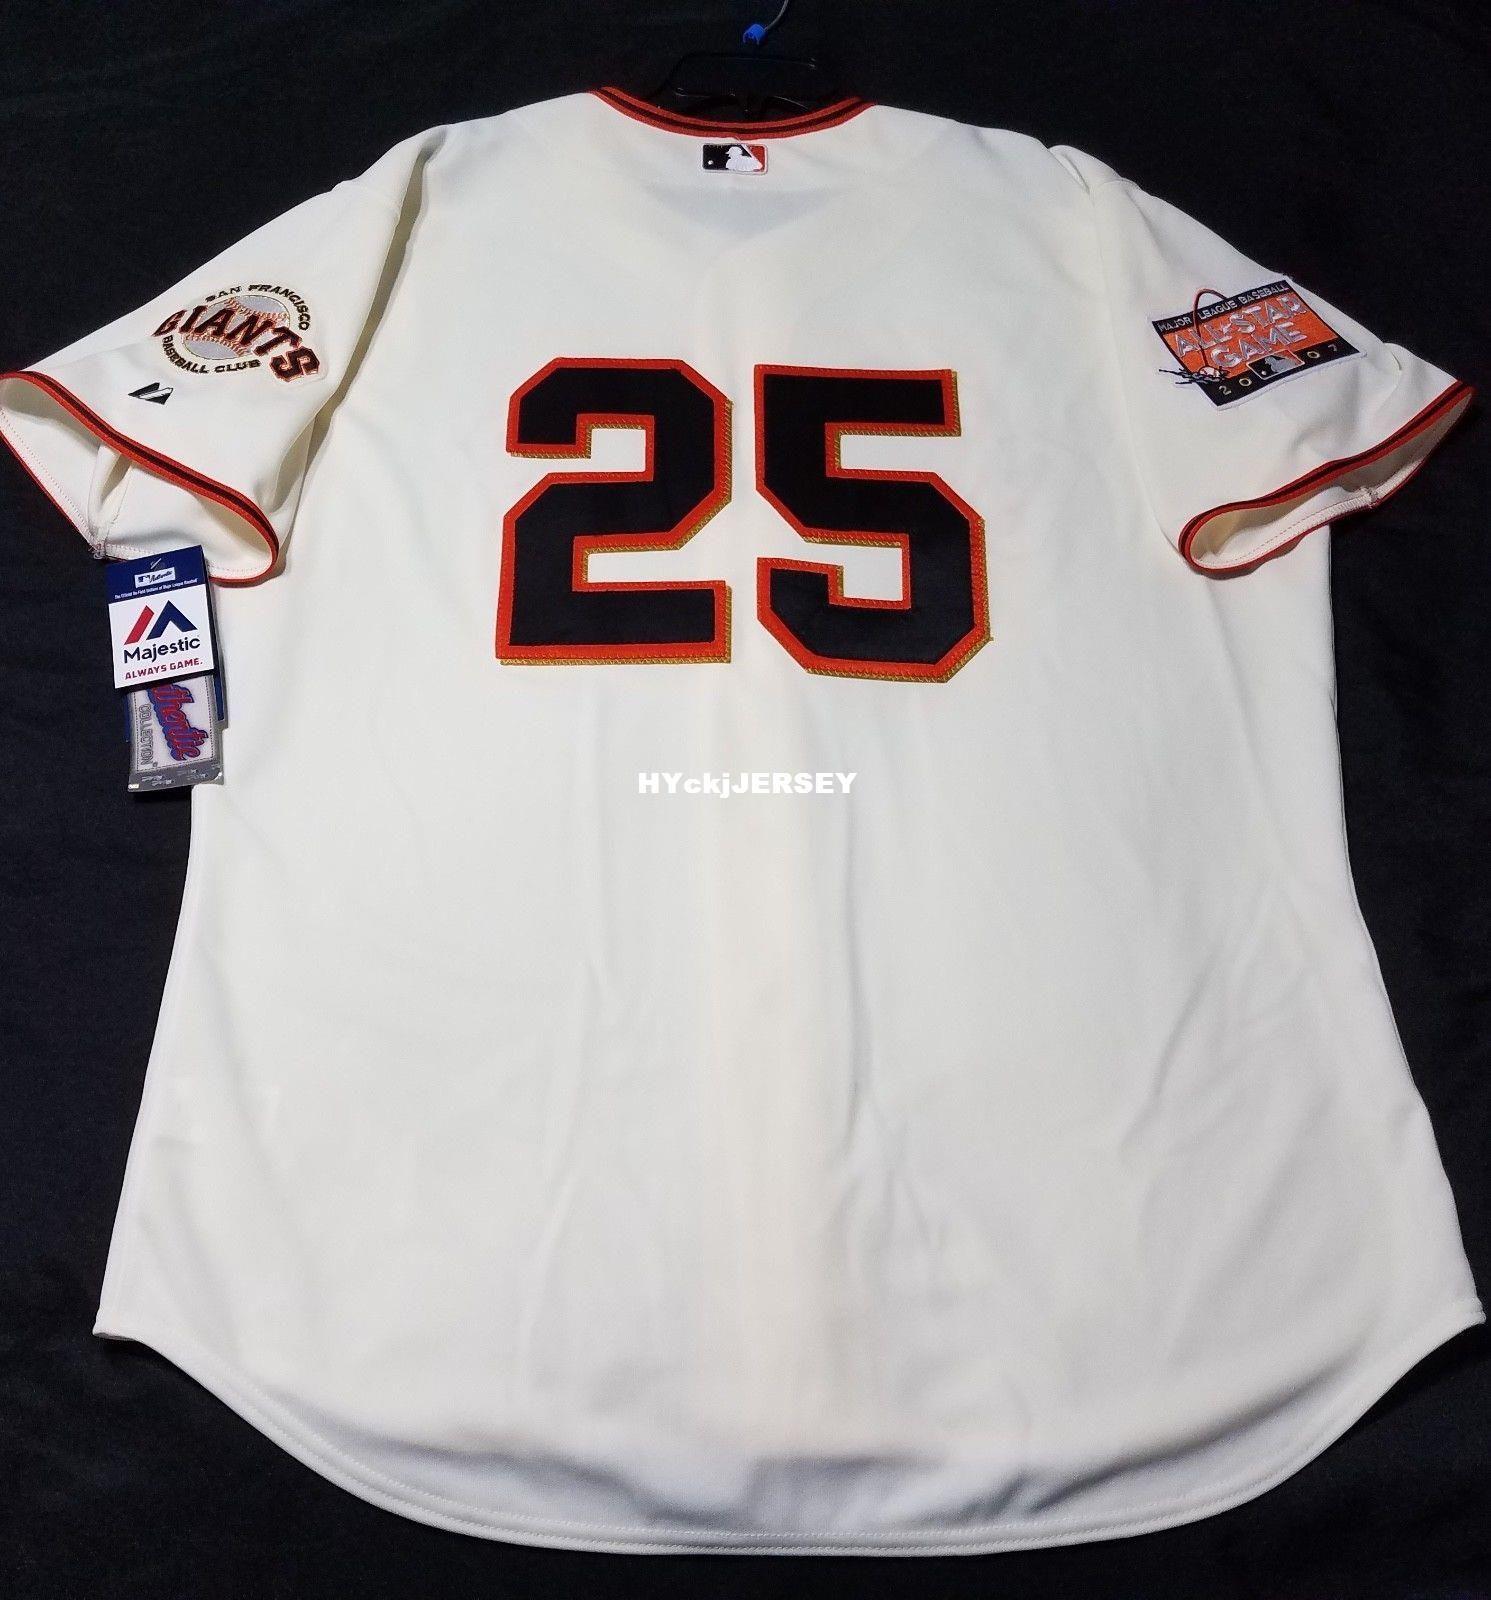 ab55fad84b4 2019 Cheap Majestic SAN FRANCISCO  25 BARRY BONDS IVORY ONFIELD Jersey Mens  Stitched Wholesale Big And Tall SIZE XS 6XL Baseball Jerseys From  Hyckjjersey